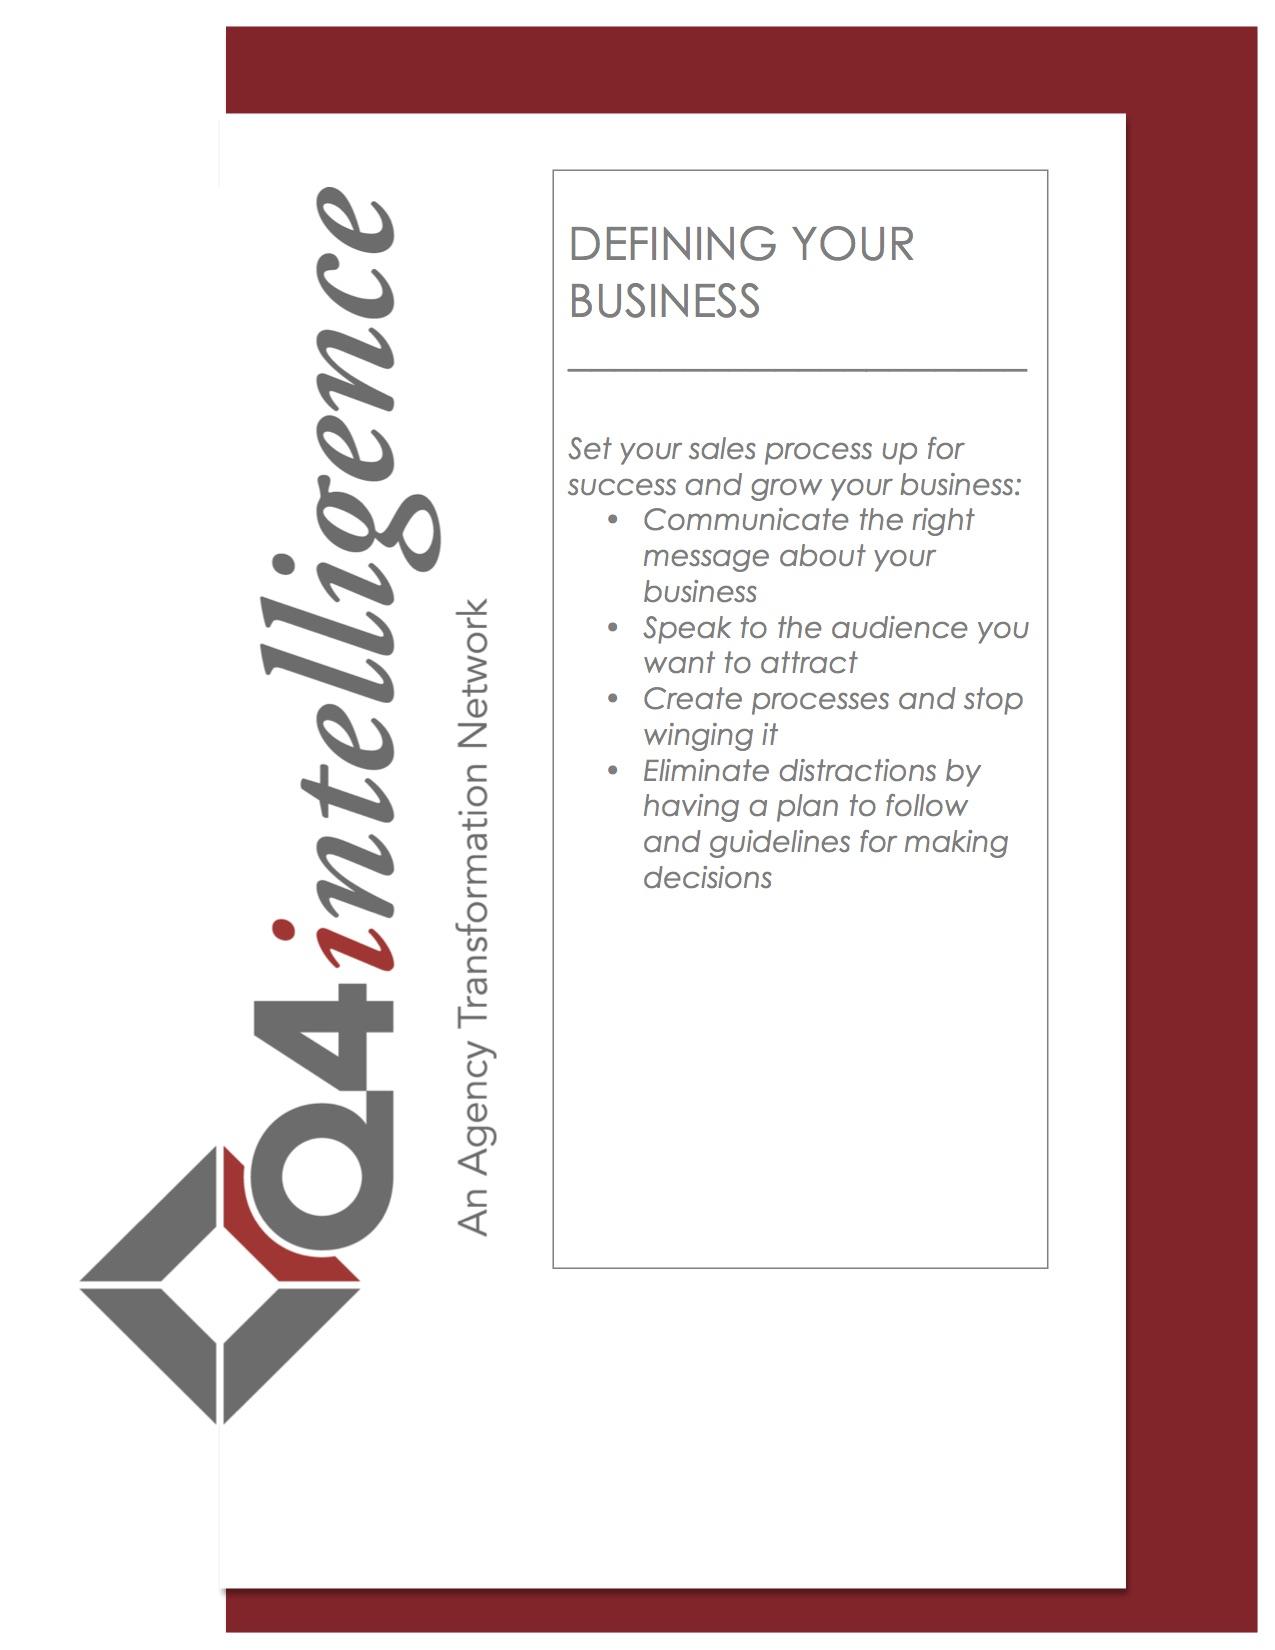 Defining Your Business Workbook Q4intelligence